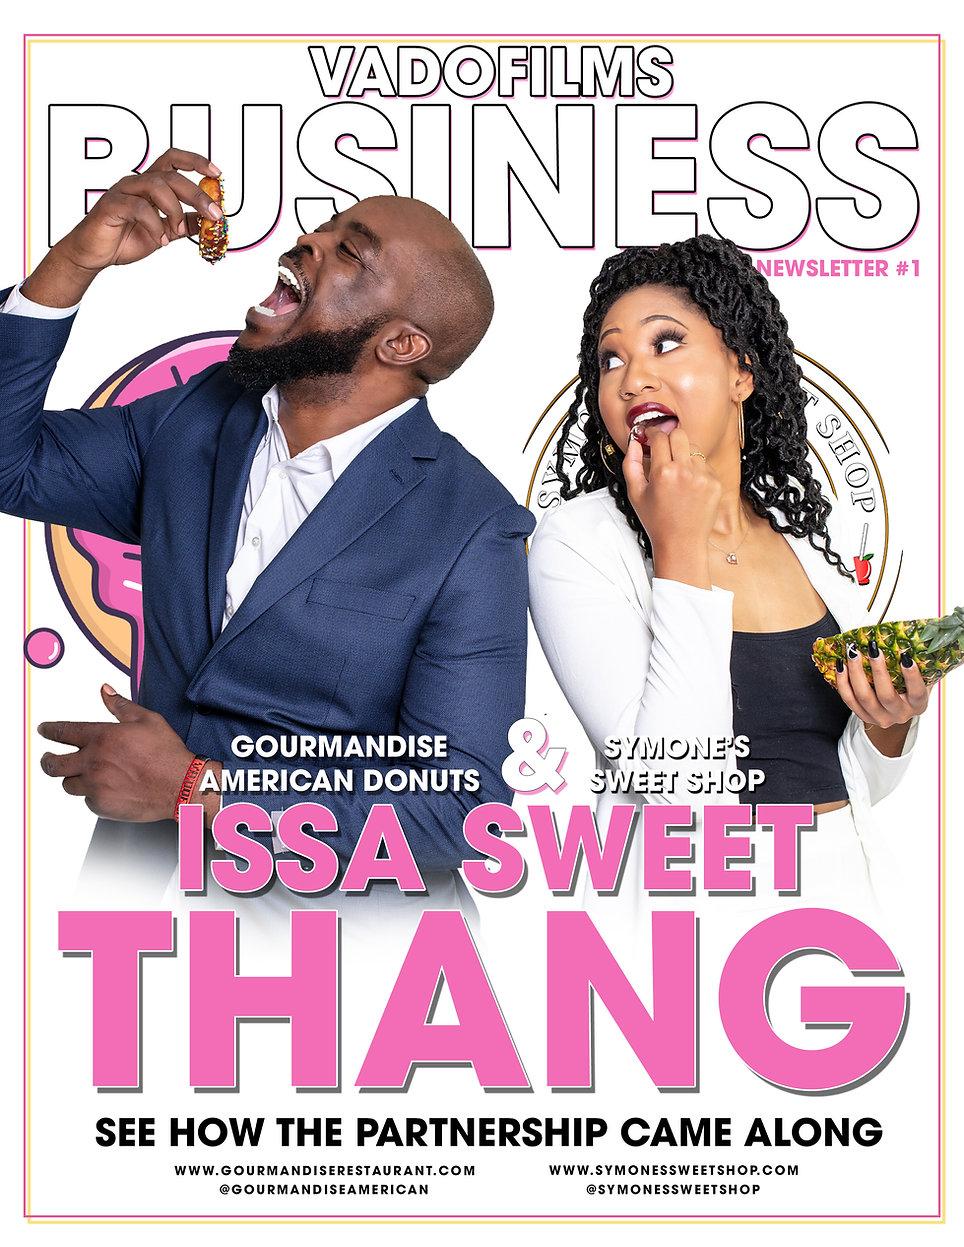 Vadofilms Business Newsletter  [Gourmandise & Symone Sweet Shop]